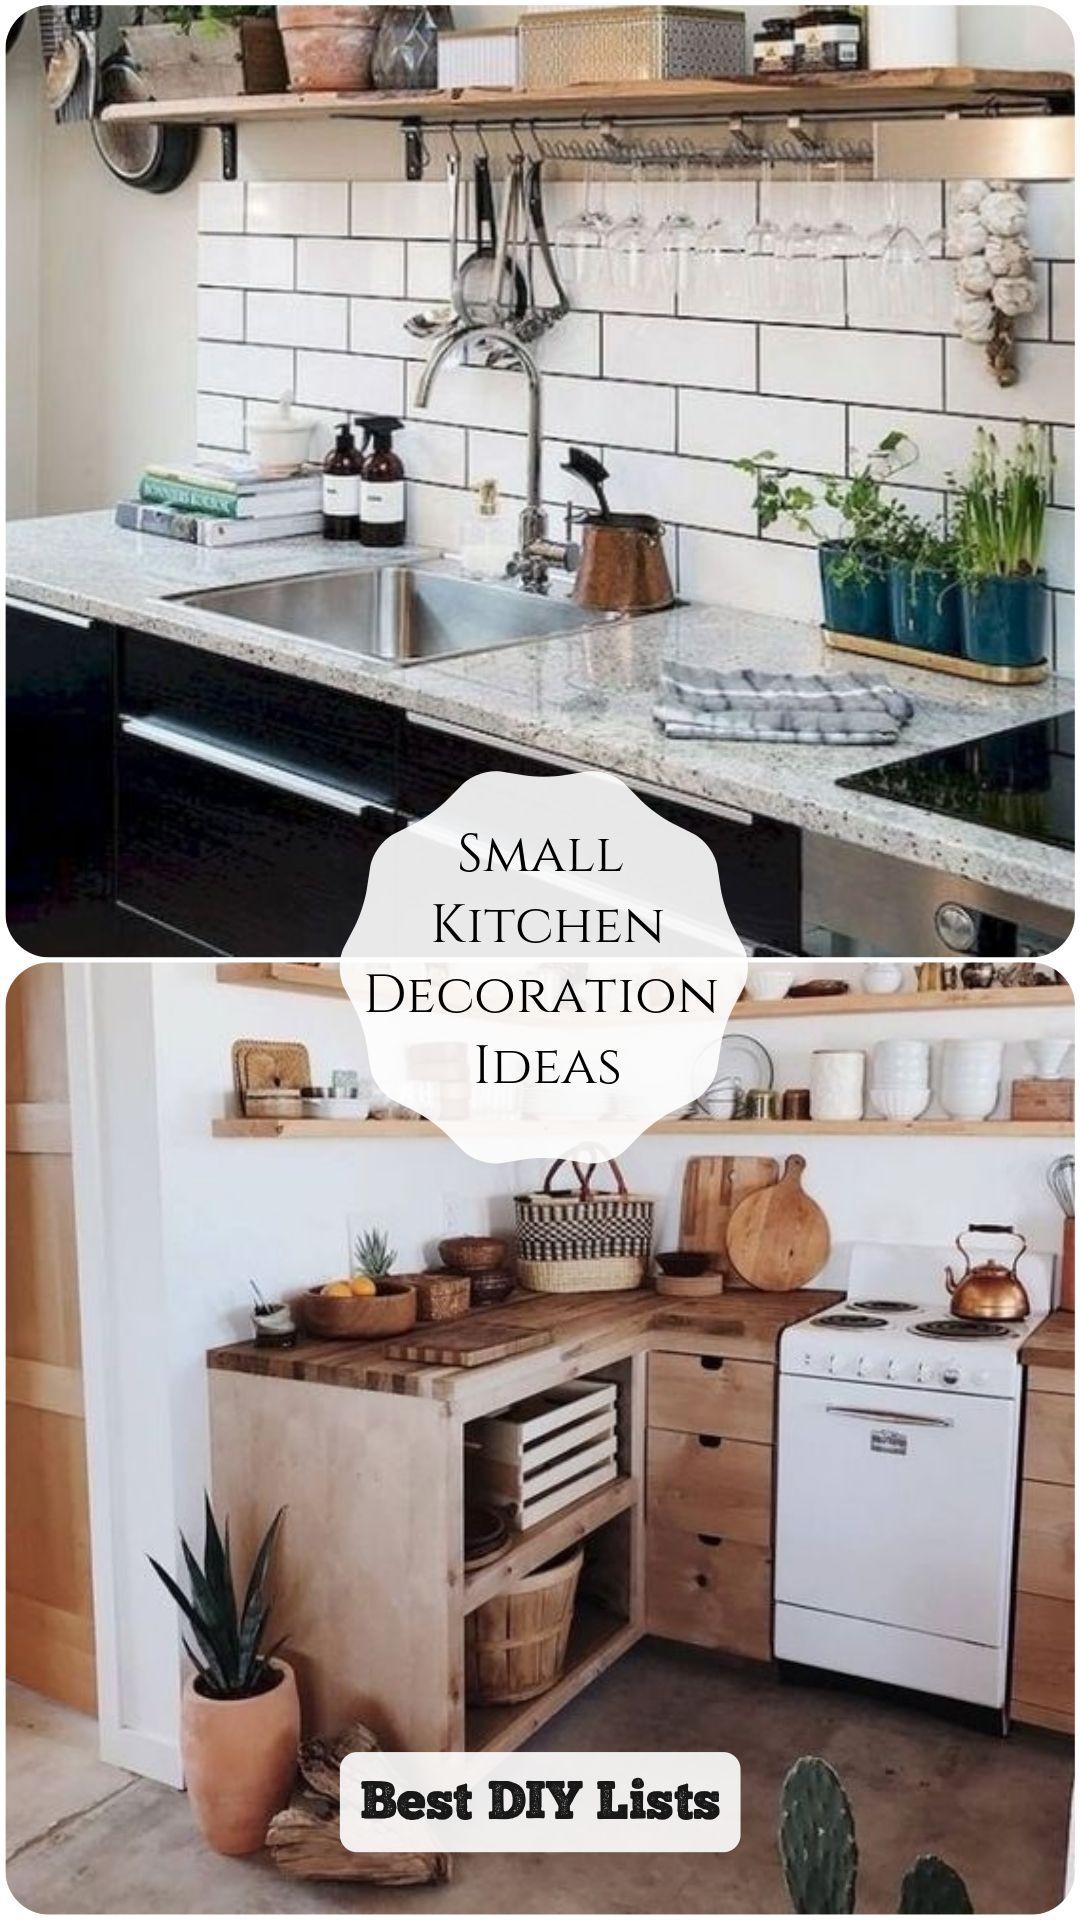 Small Kitchen Decoration Ideas Kitchen Decor Cheap Kitchen Decor Kitchen Remodel Small